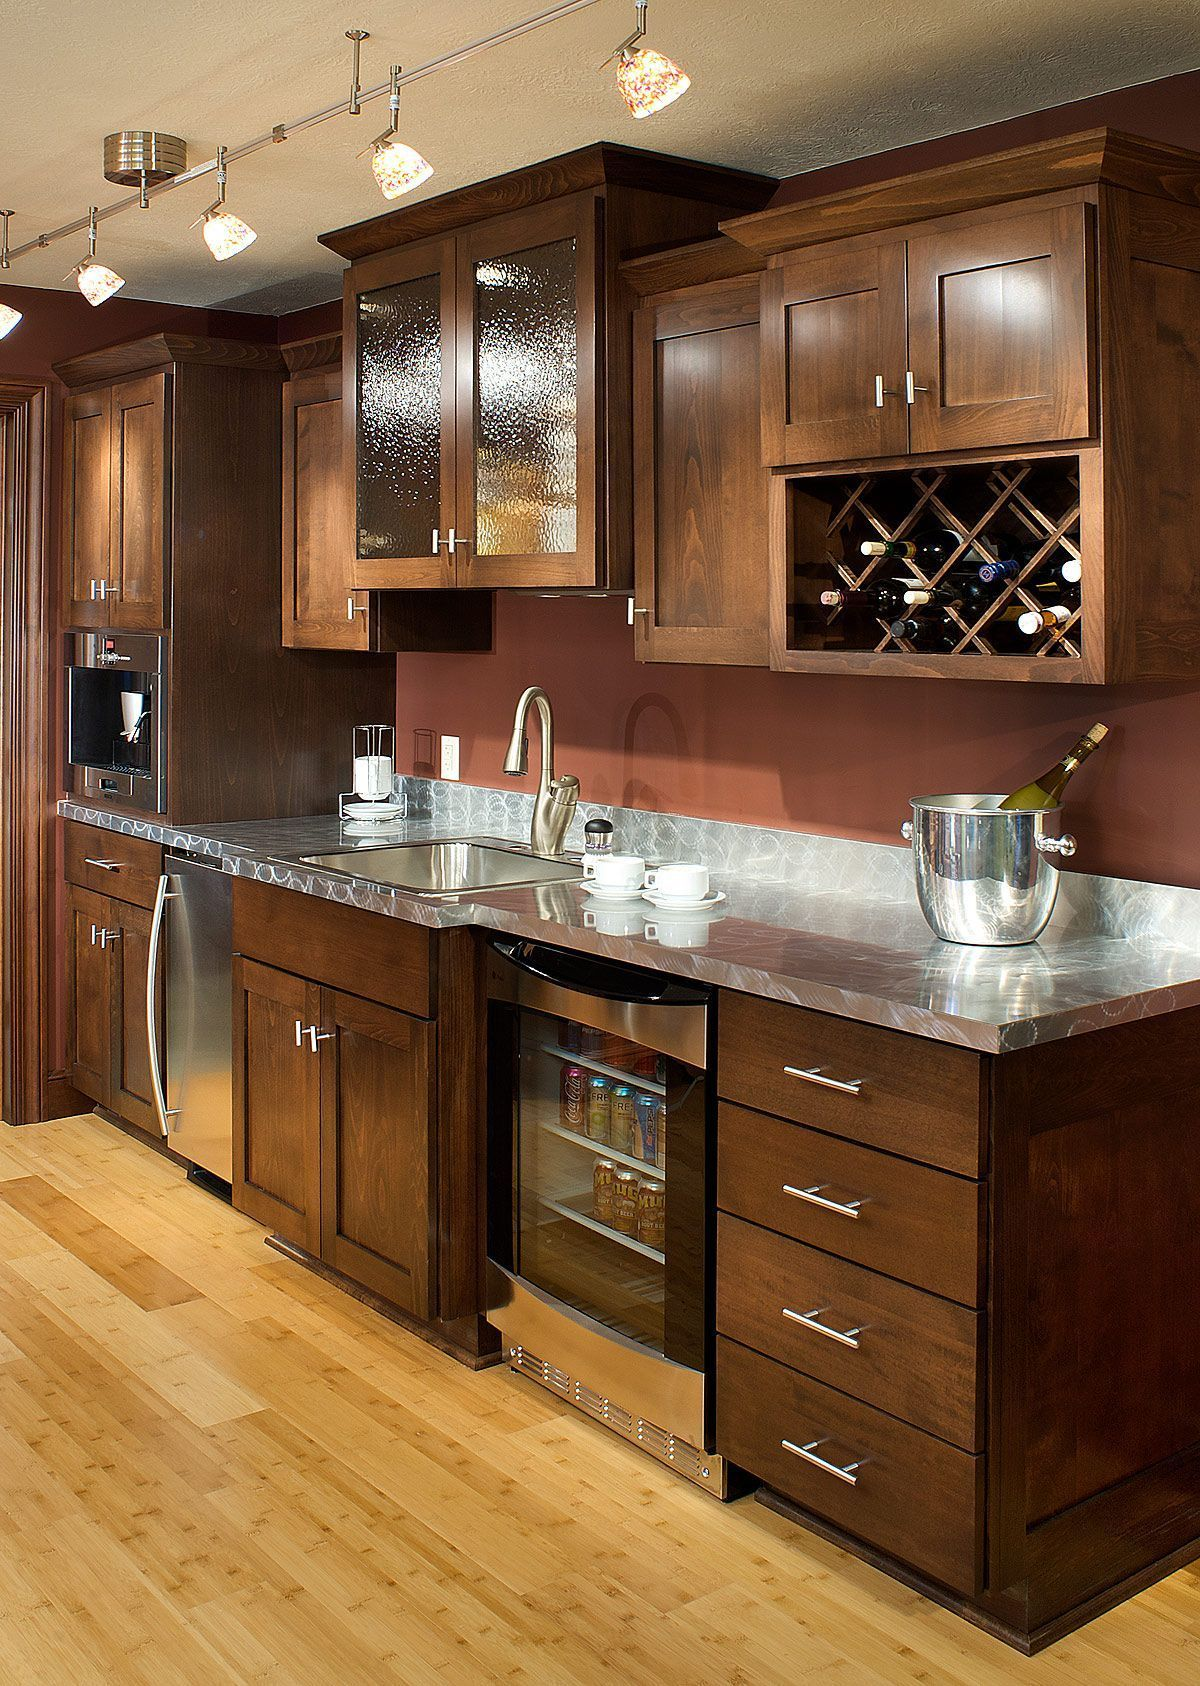 design center wet bar kitchen design pictures pictures of kitchens kitchen cabinet idea on kitchen decor pitchers carafes id=46473